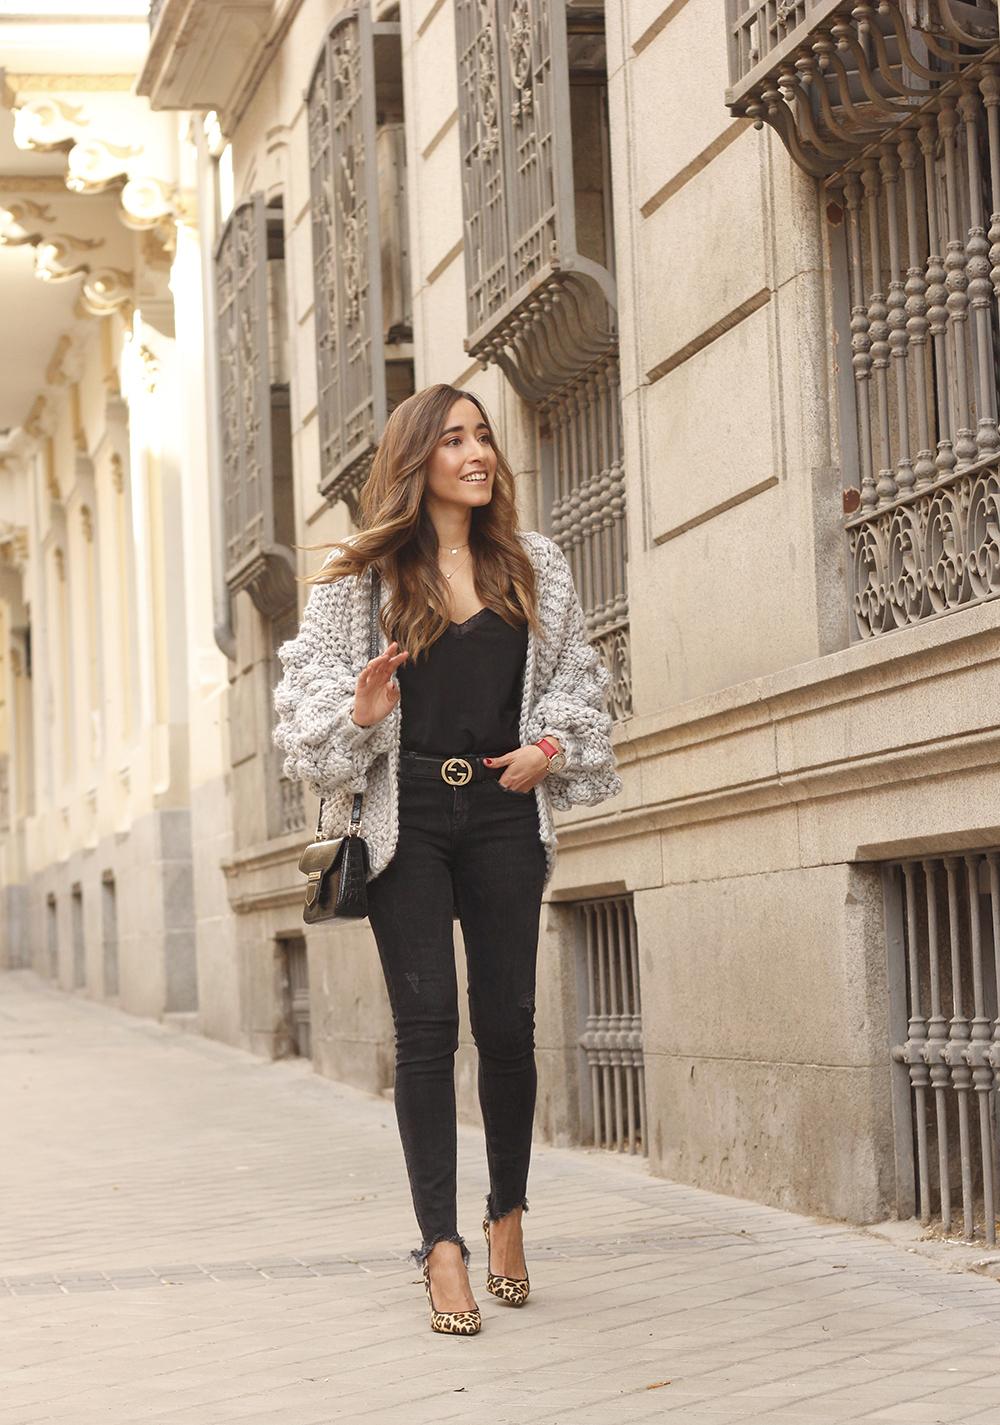 Grey cardigan black jeans folli folie watch leopard print heels starbucks tea street style fall outfit 201804